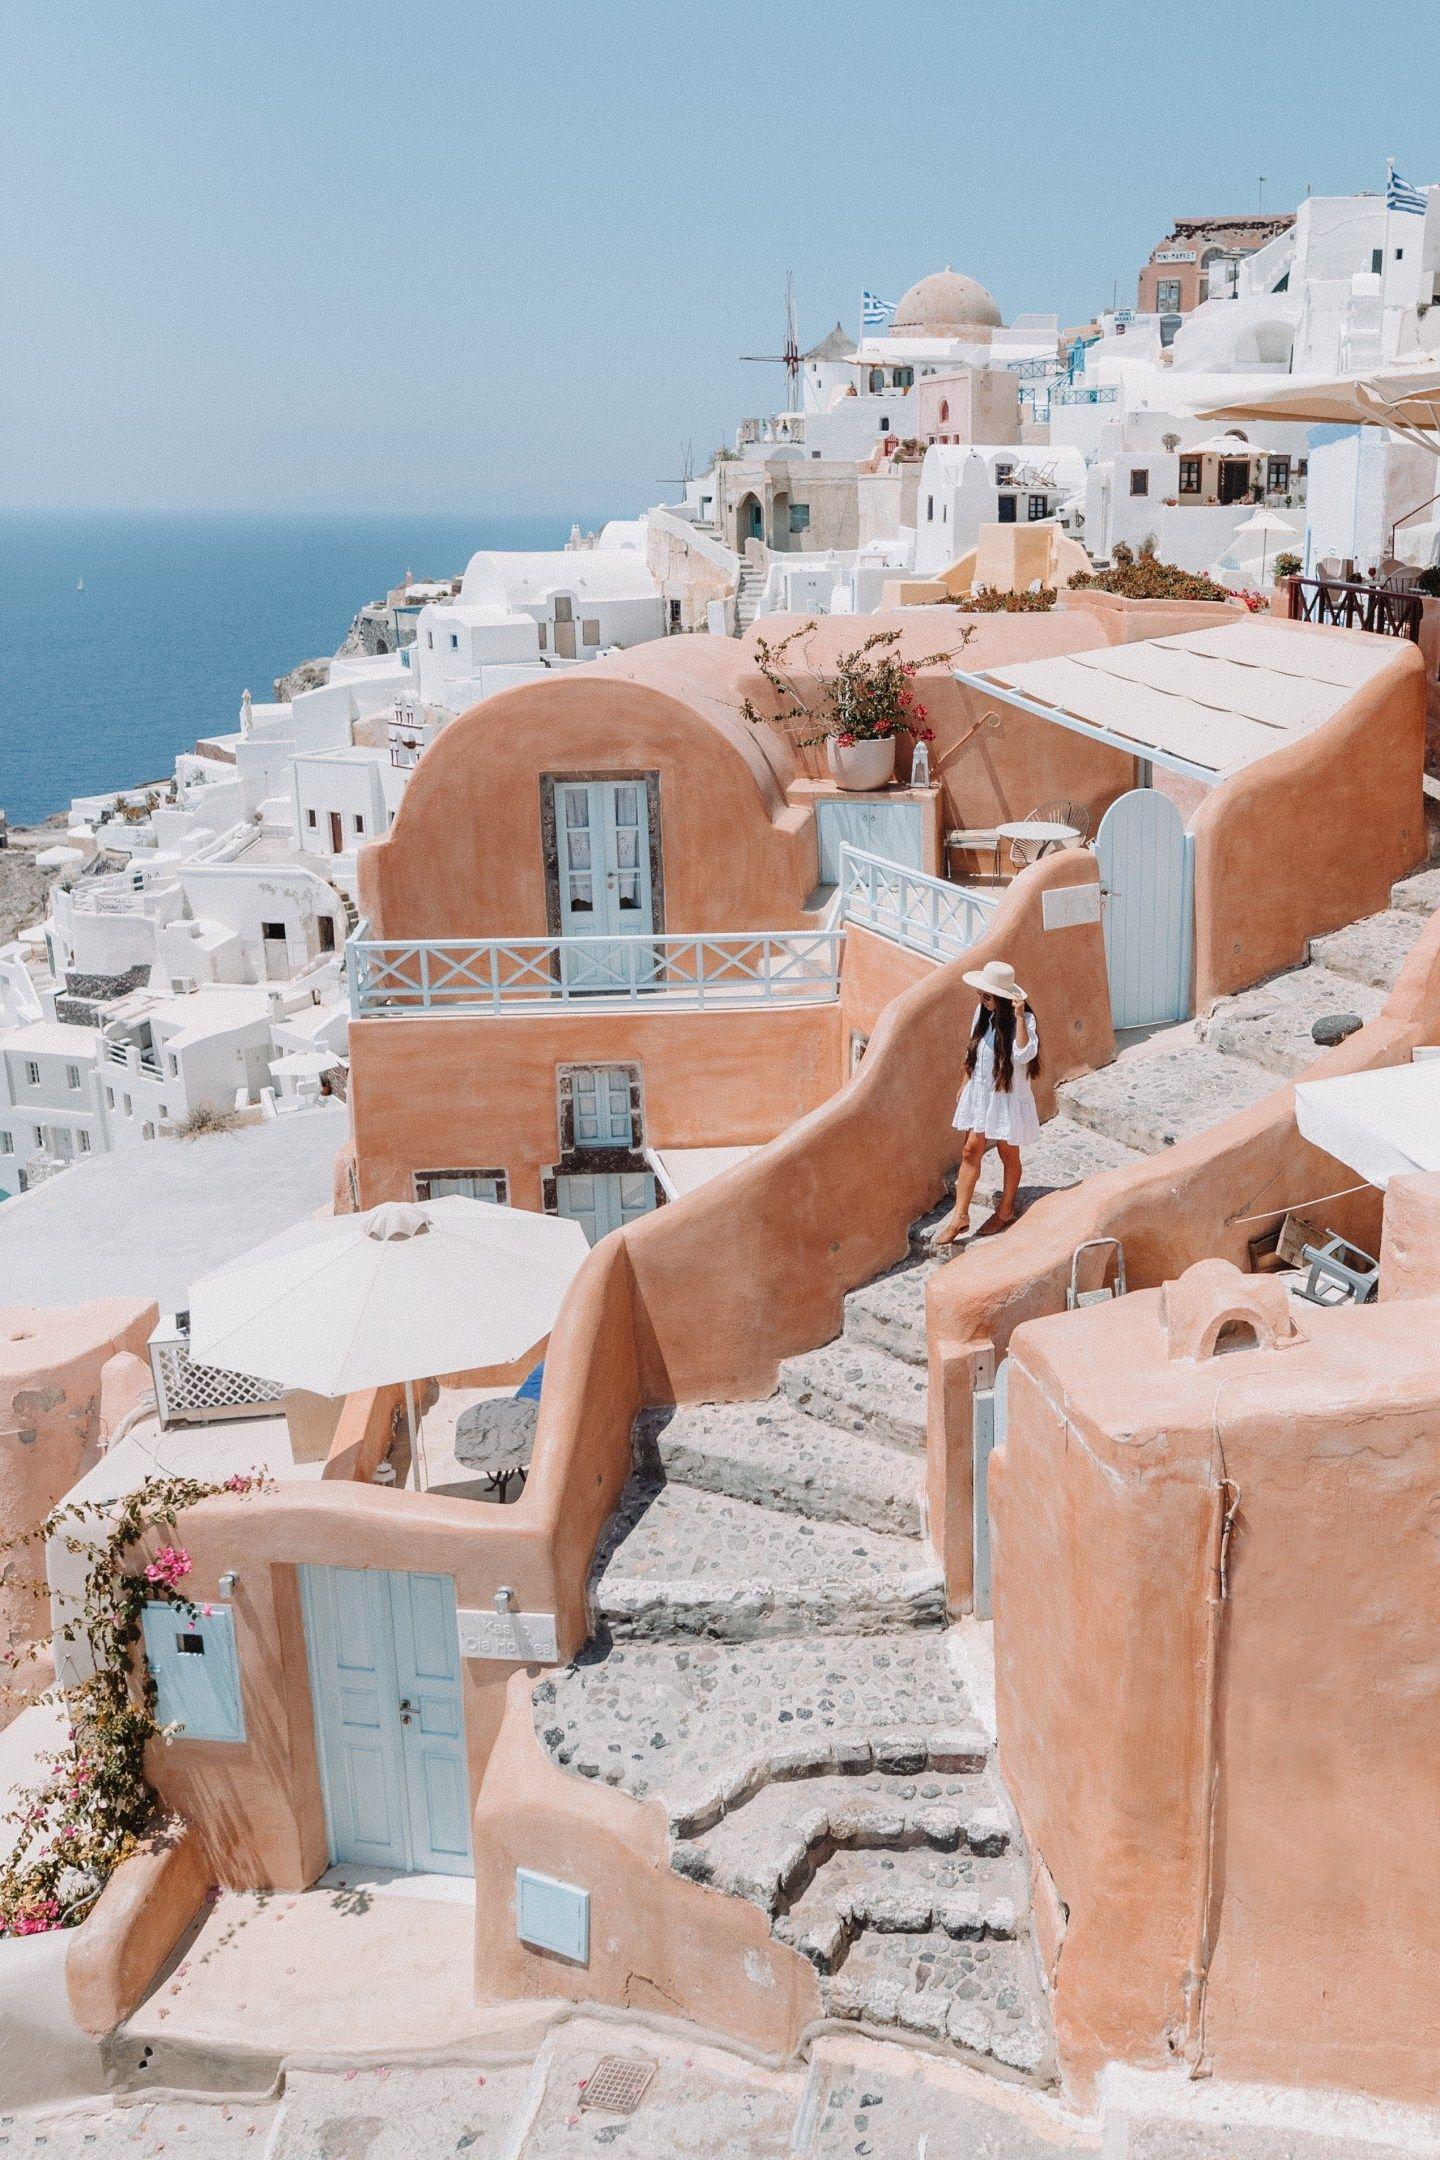 The 5 Best Photo Locations In Santorini Greece Alexandra Taylor Santorini Travel Santorini Greece Santorini Travel Guide